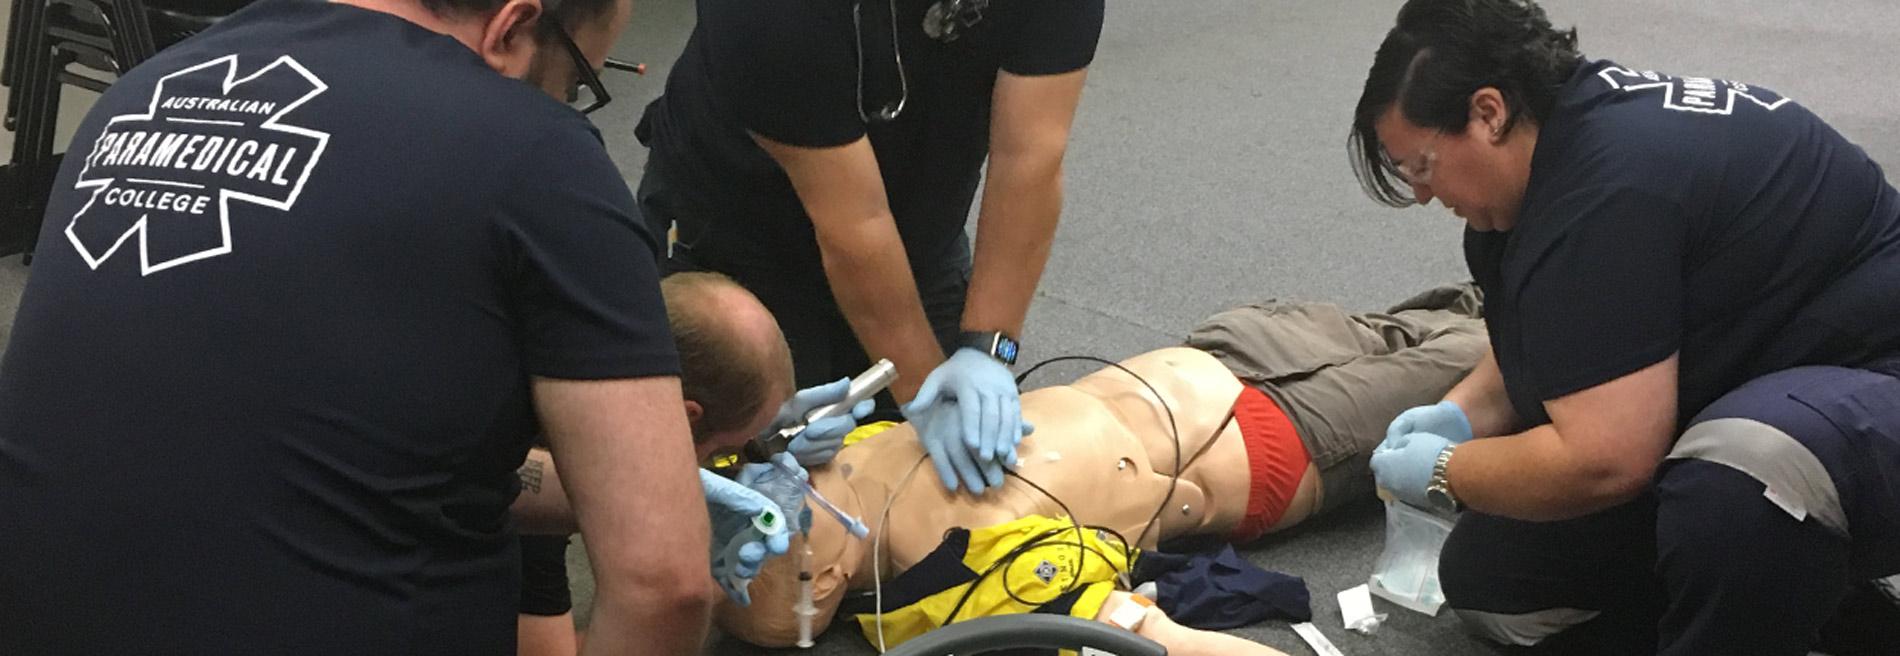 Cardiac arrest simulation students resus